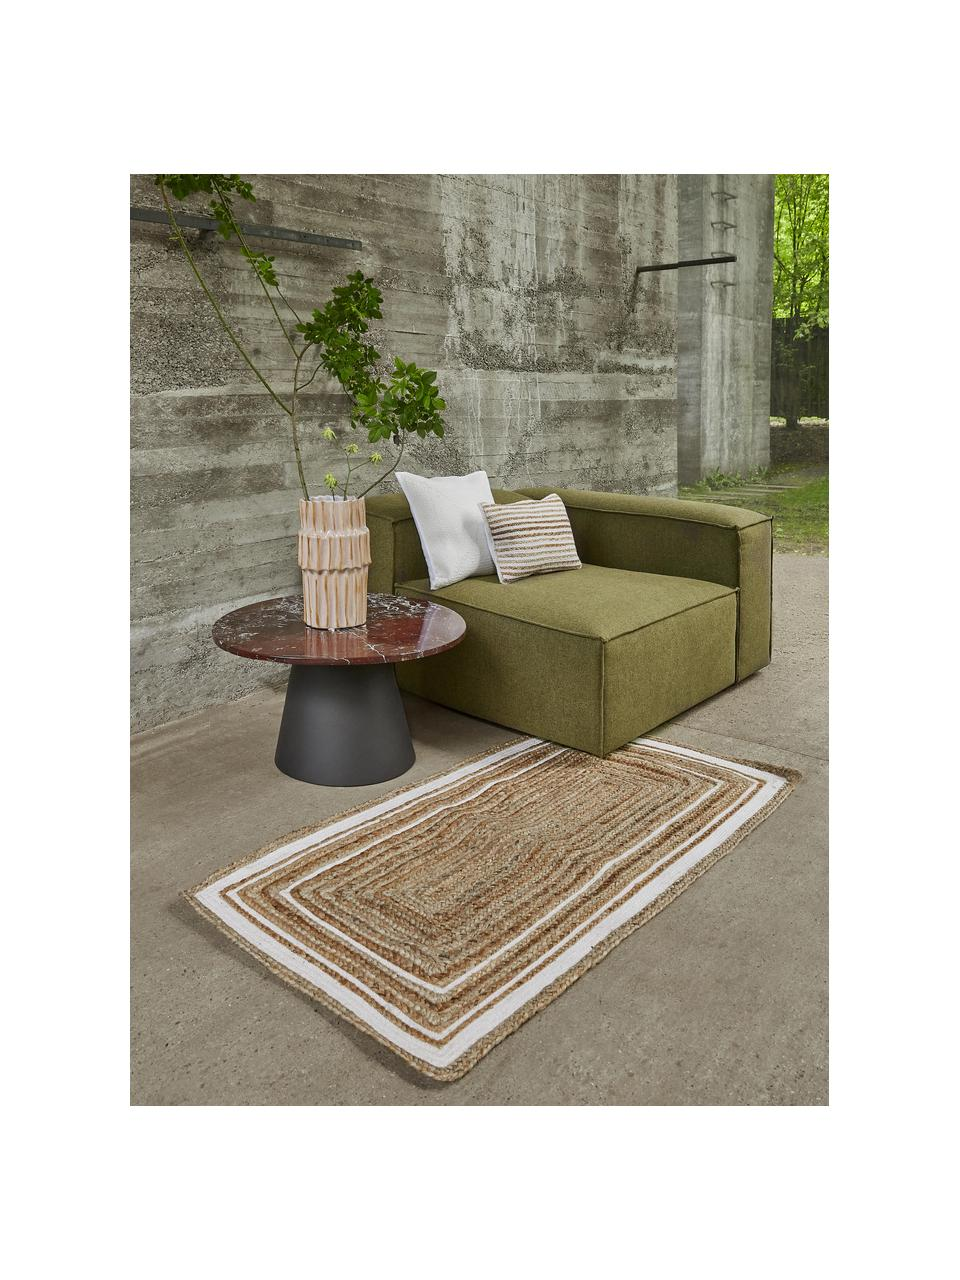 Handgewebter Jute-Teppich Clover, 100% Jute, Beige, Weiß, B 120 x L 180 cm (Größe S)